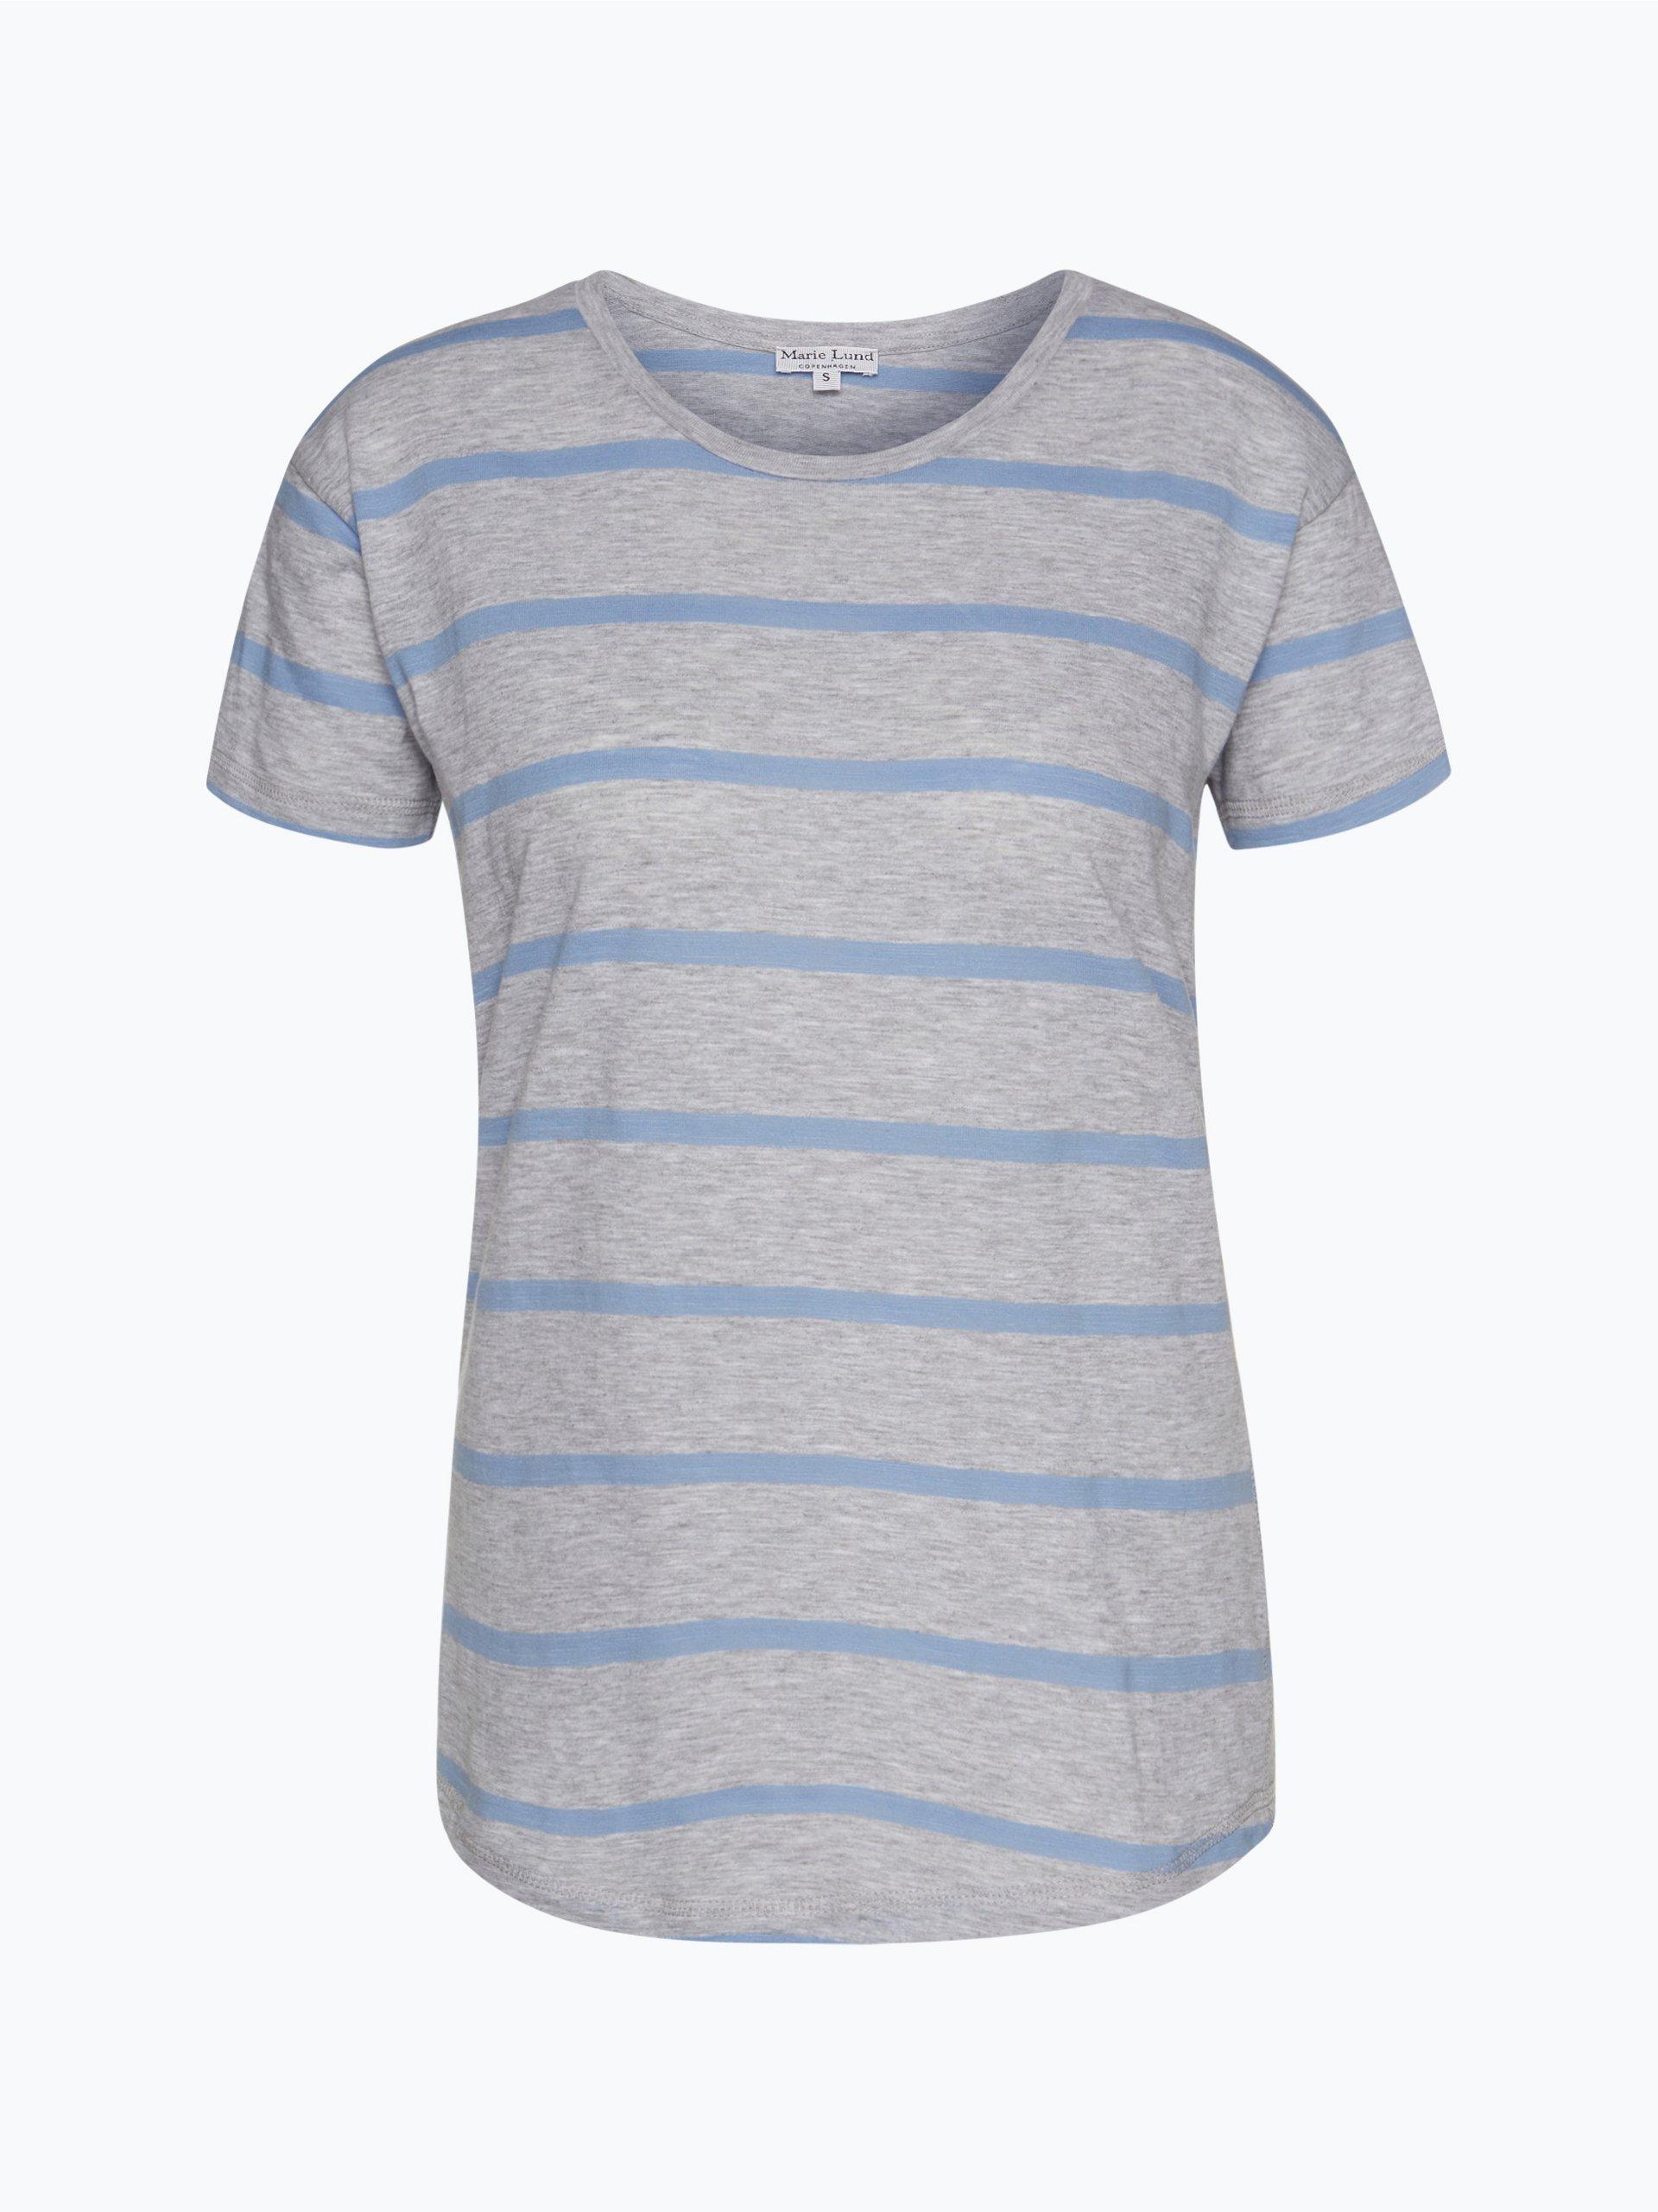 marie lund damen t shirt blau gestreift online kaufen vangraaf com. Black Bedroom Furniture Sets. Home Design Ideas